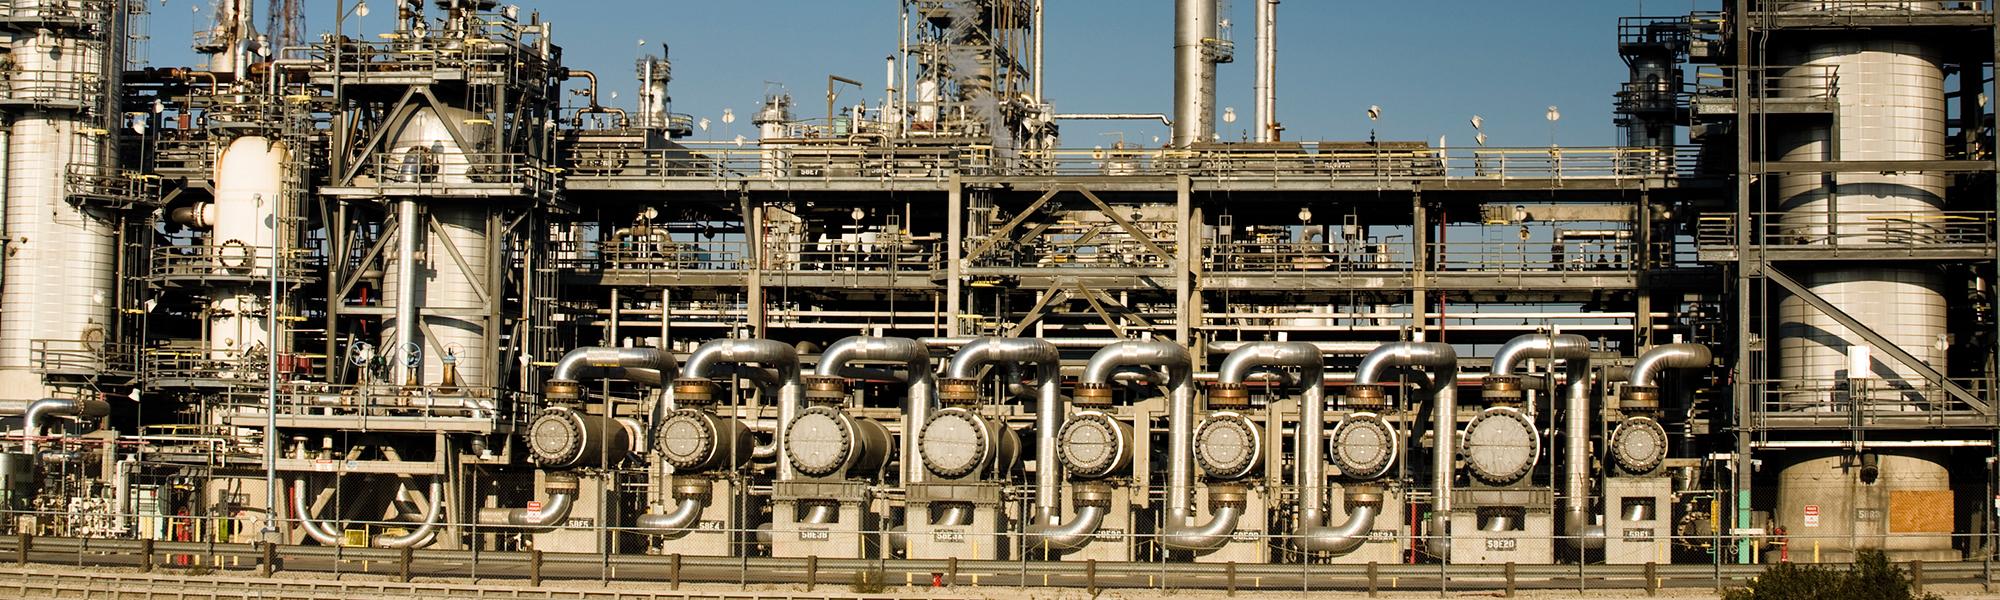 Chemical & Petroleum